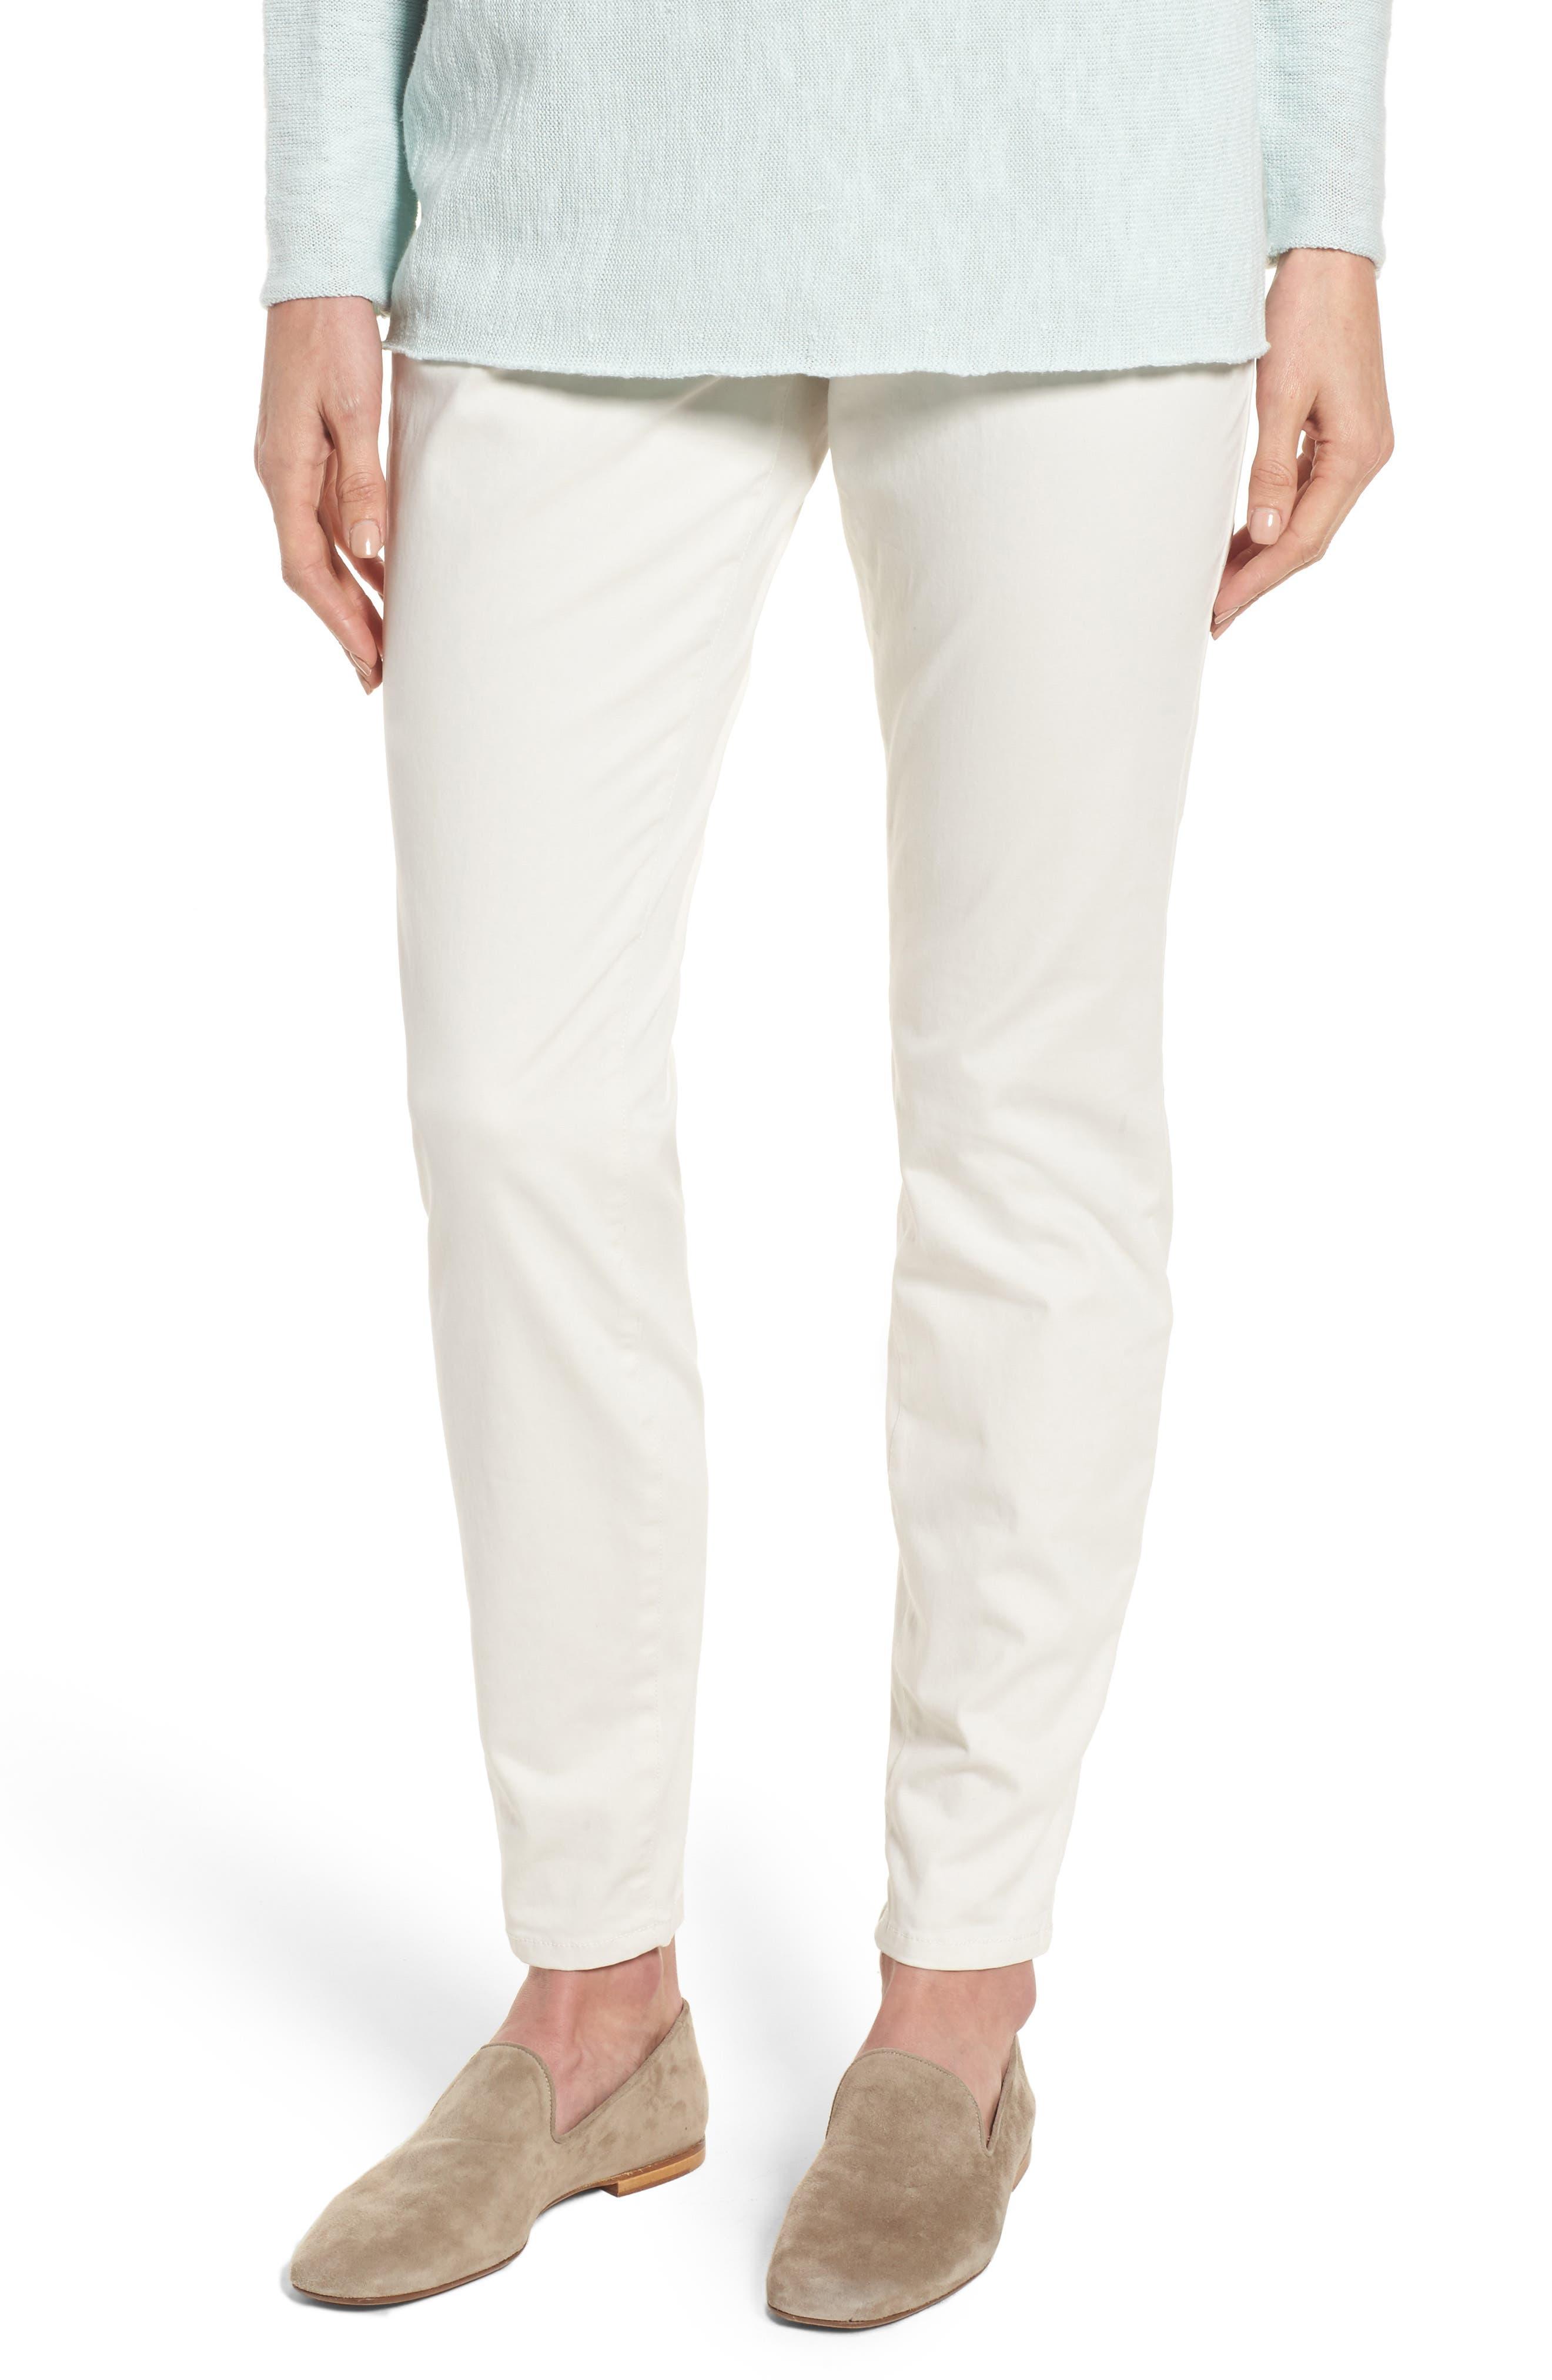 Stretch Organic Cotton Denim Skinny Pants,                             Main thumbnail 1, color,                             Bone